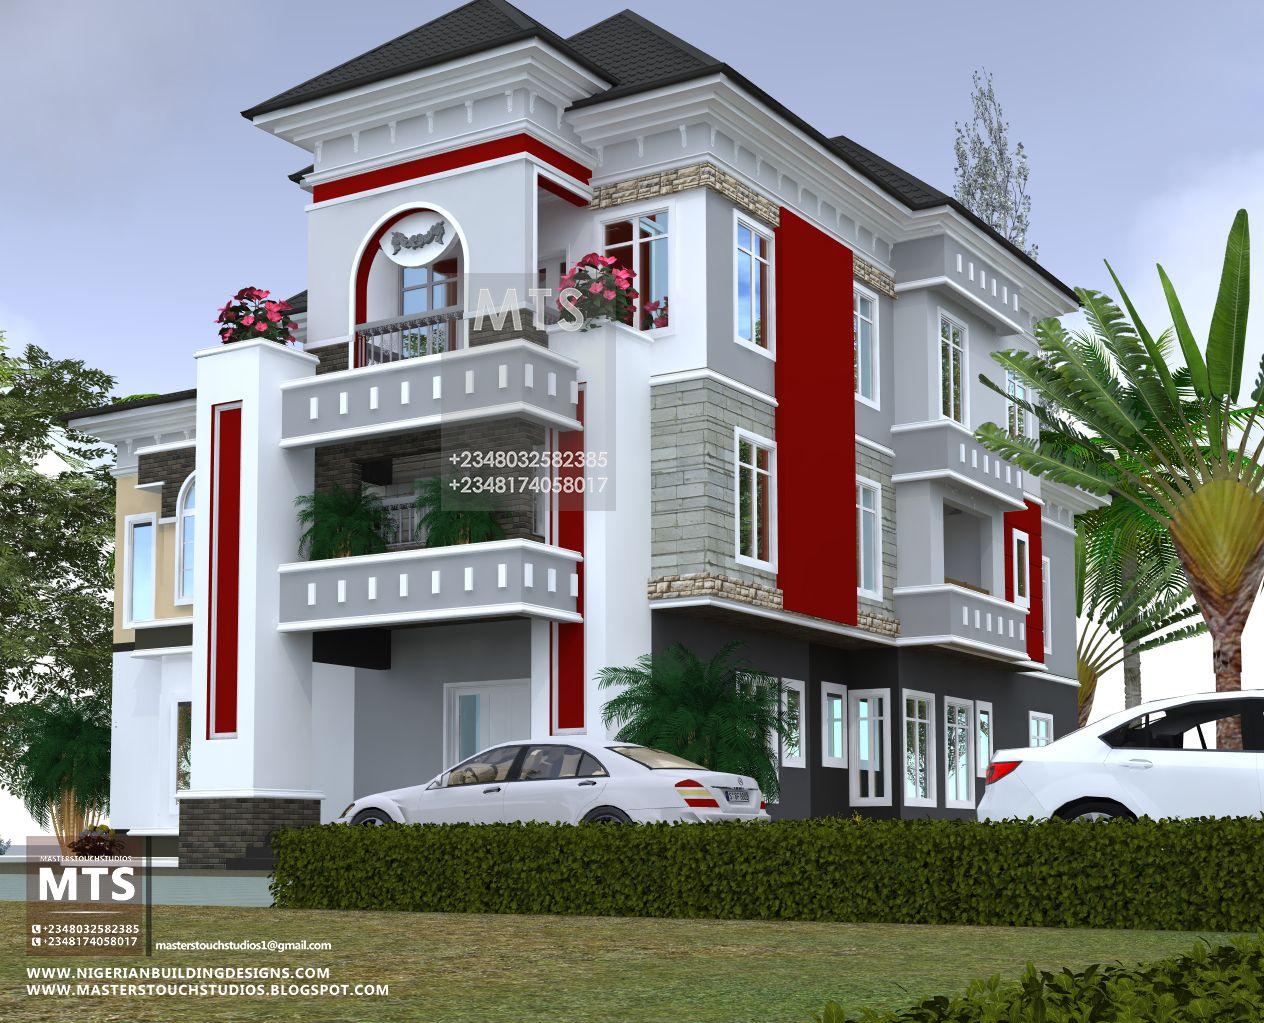 Milda S Home Small House Design Exterior House Front Design Duplex House Design